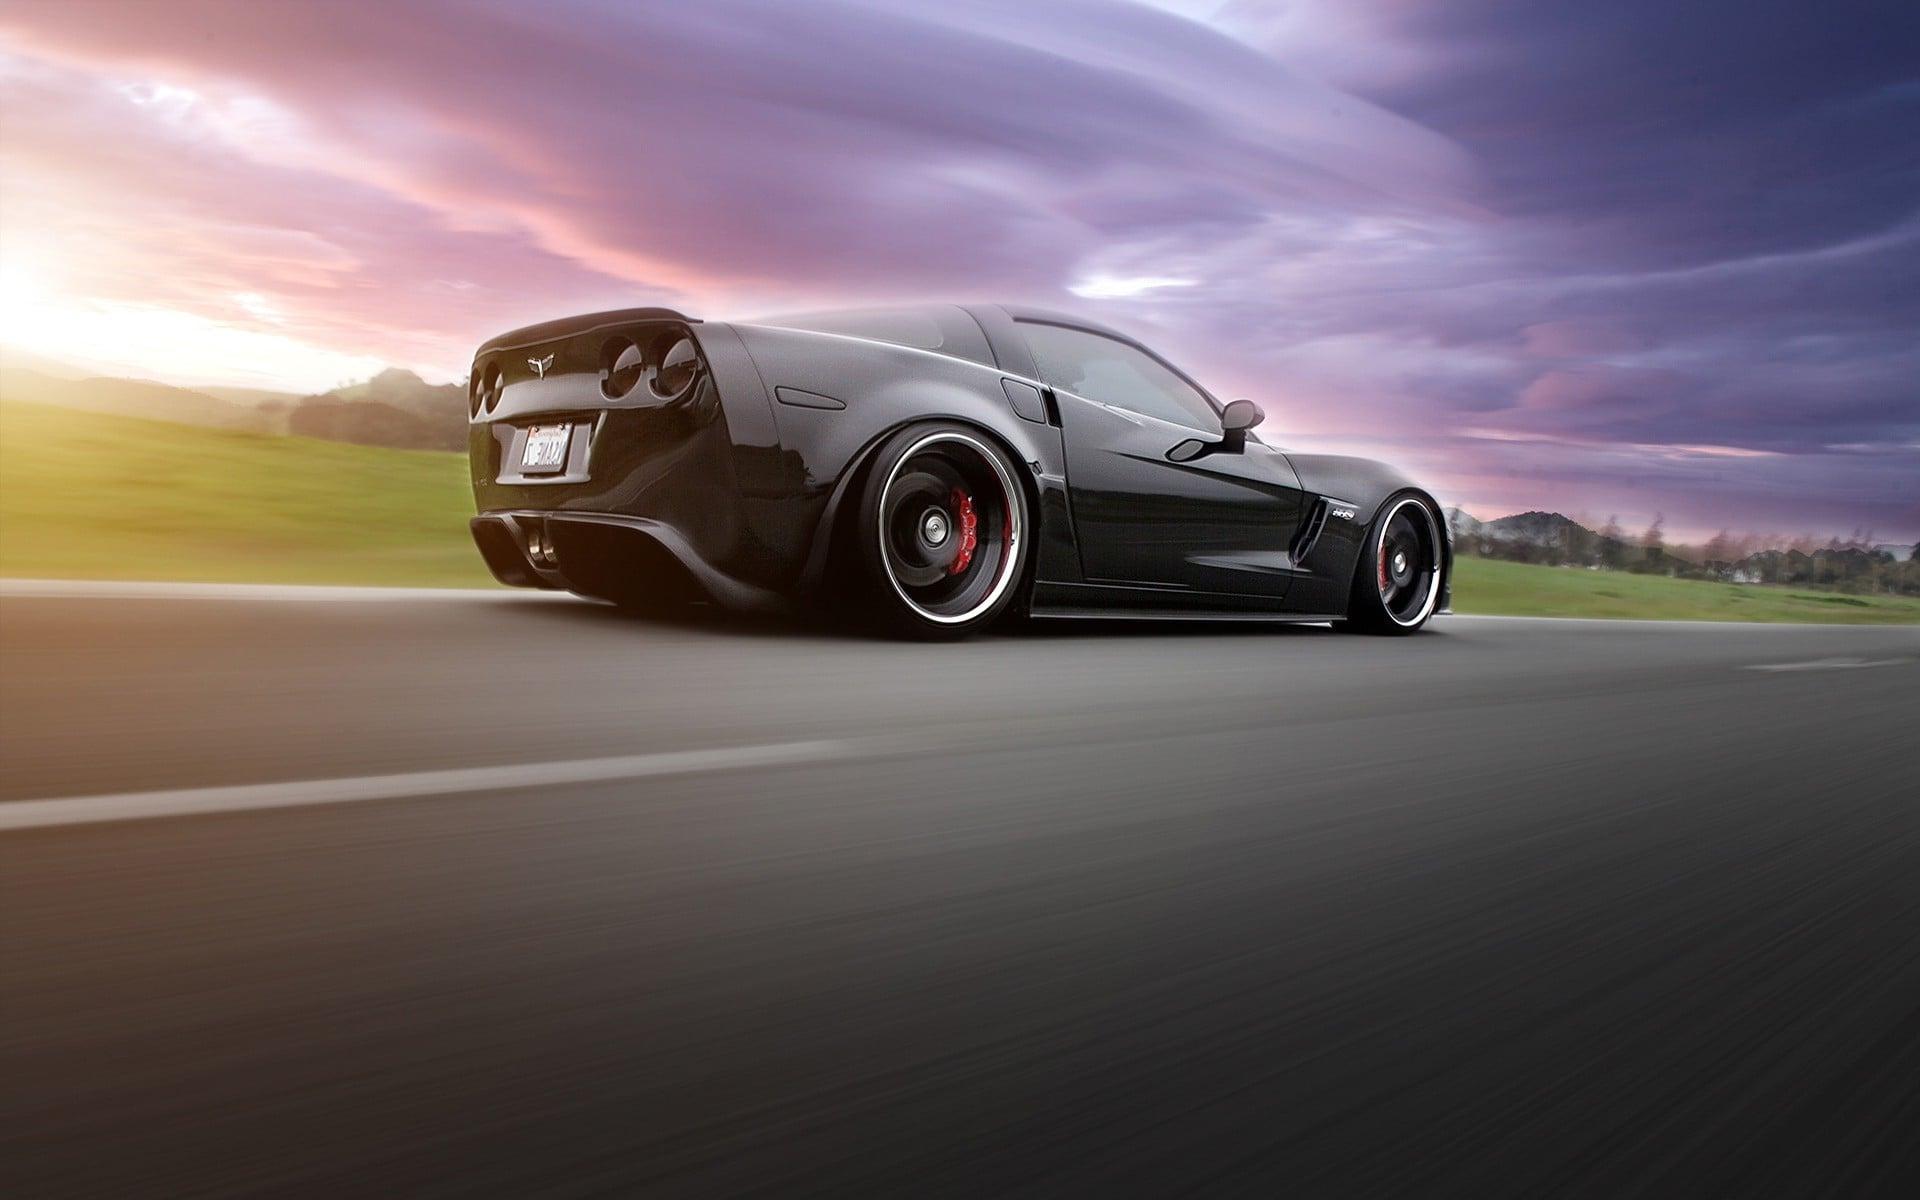 C6 corvette wallpapers top free c6 corvette backgrounds wallpaperaccess - Corvette c6 wallpaper ...